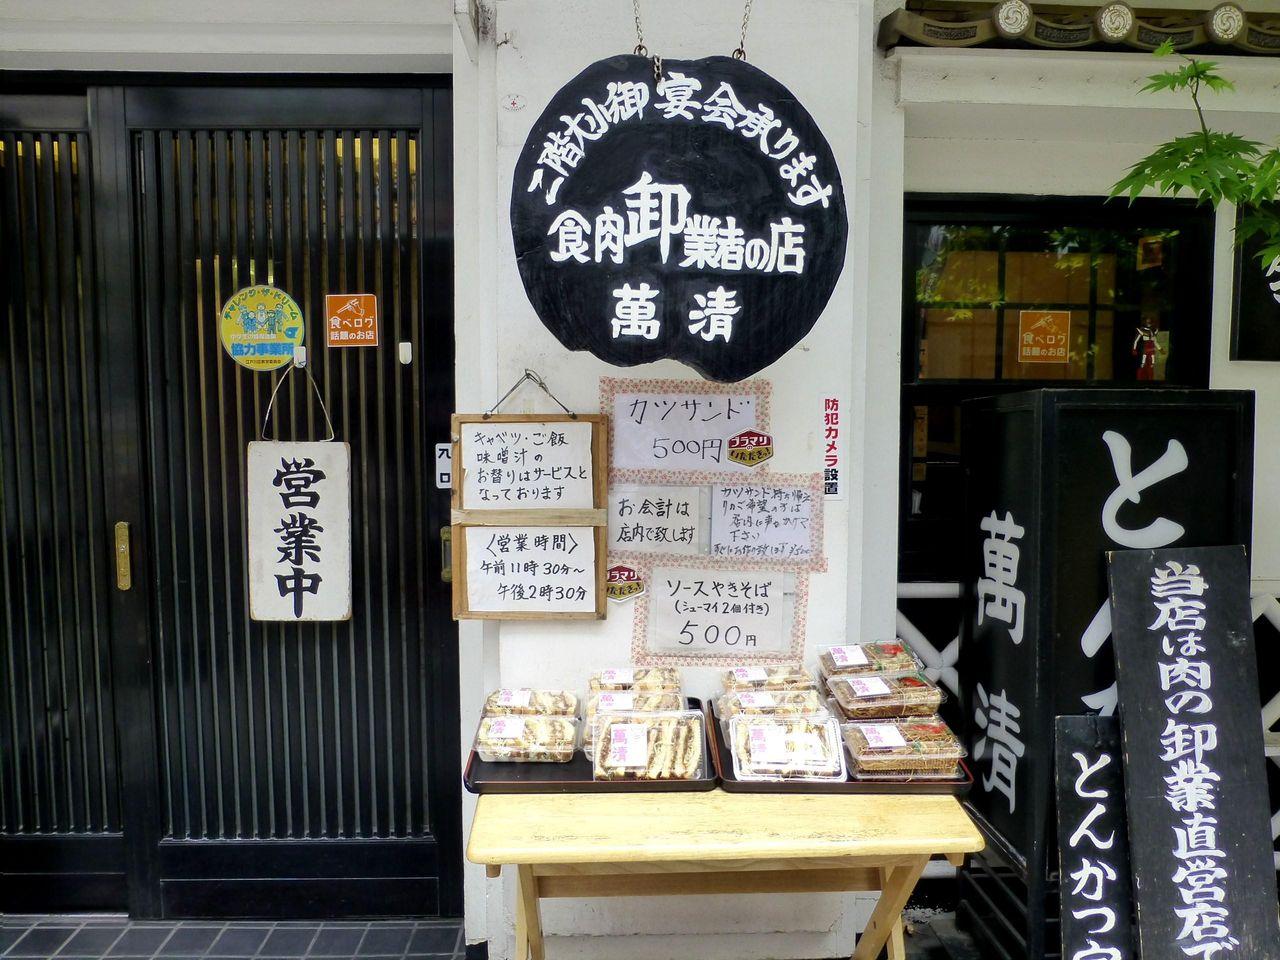 食肉卸業者の店「萬清」